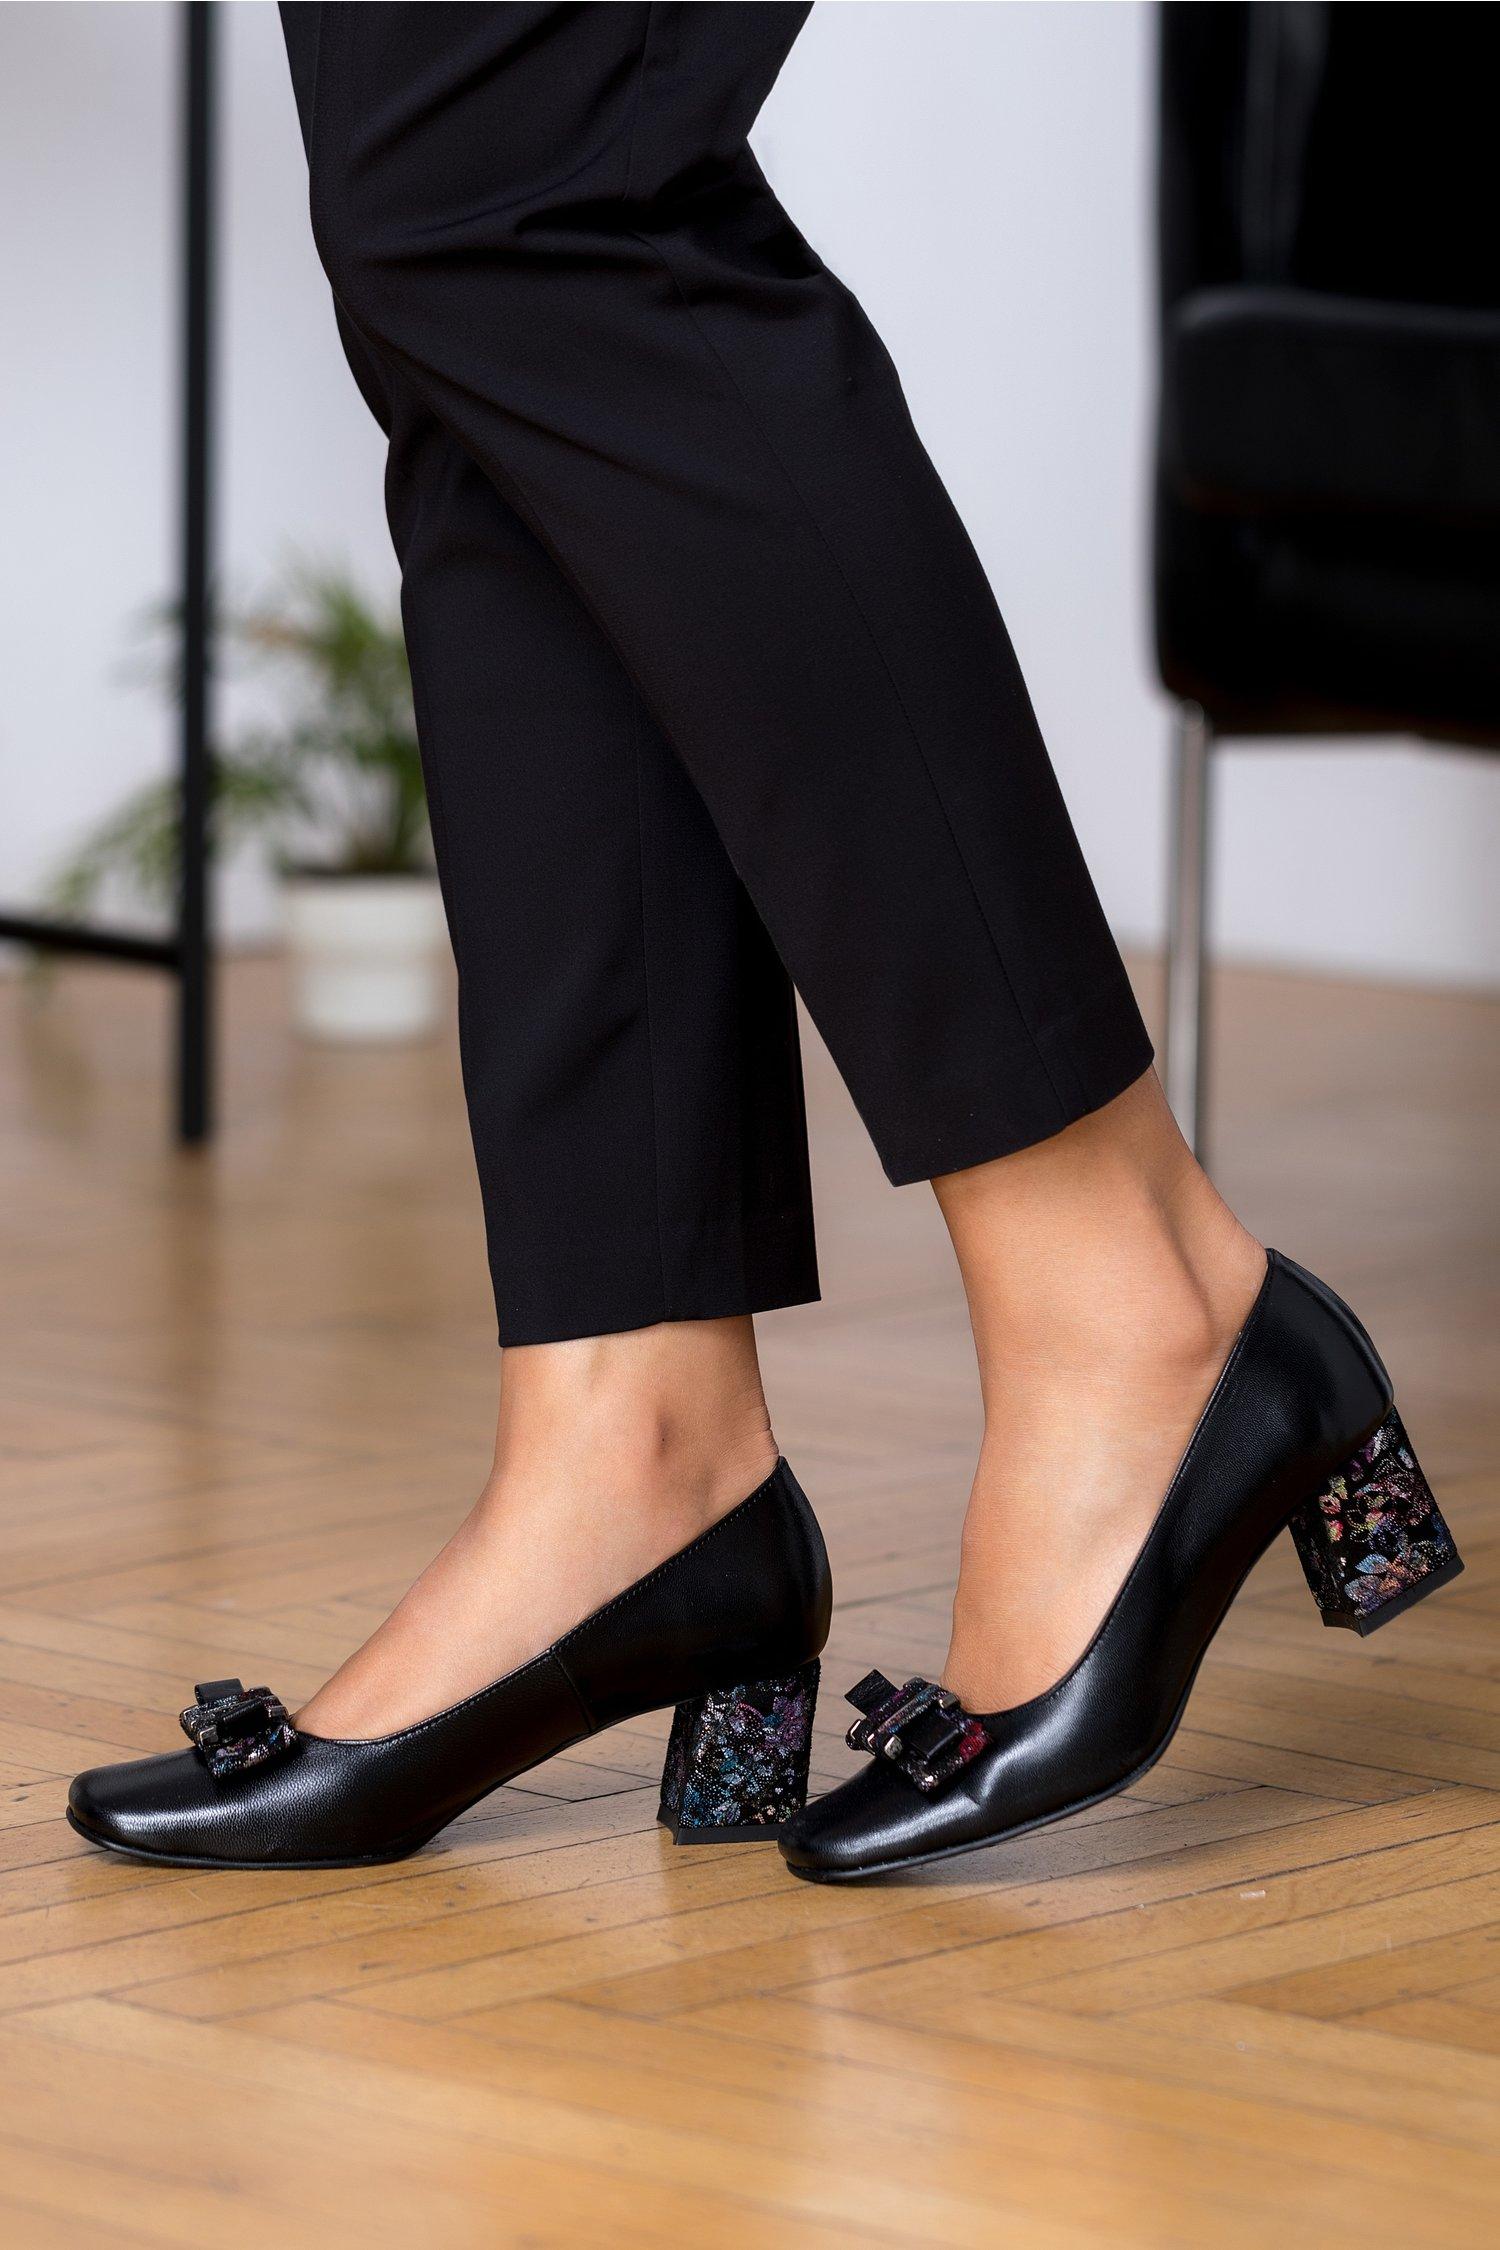 Pantofi negri cu fundita si toc cu motive florale si sclipici